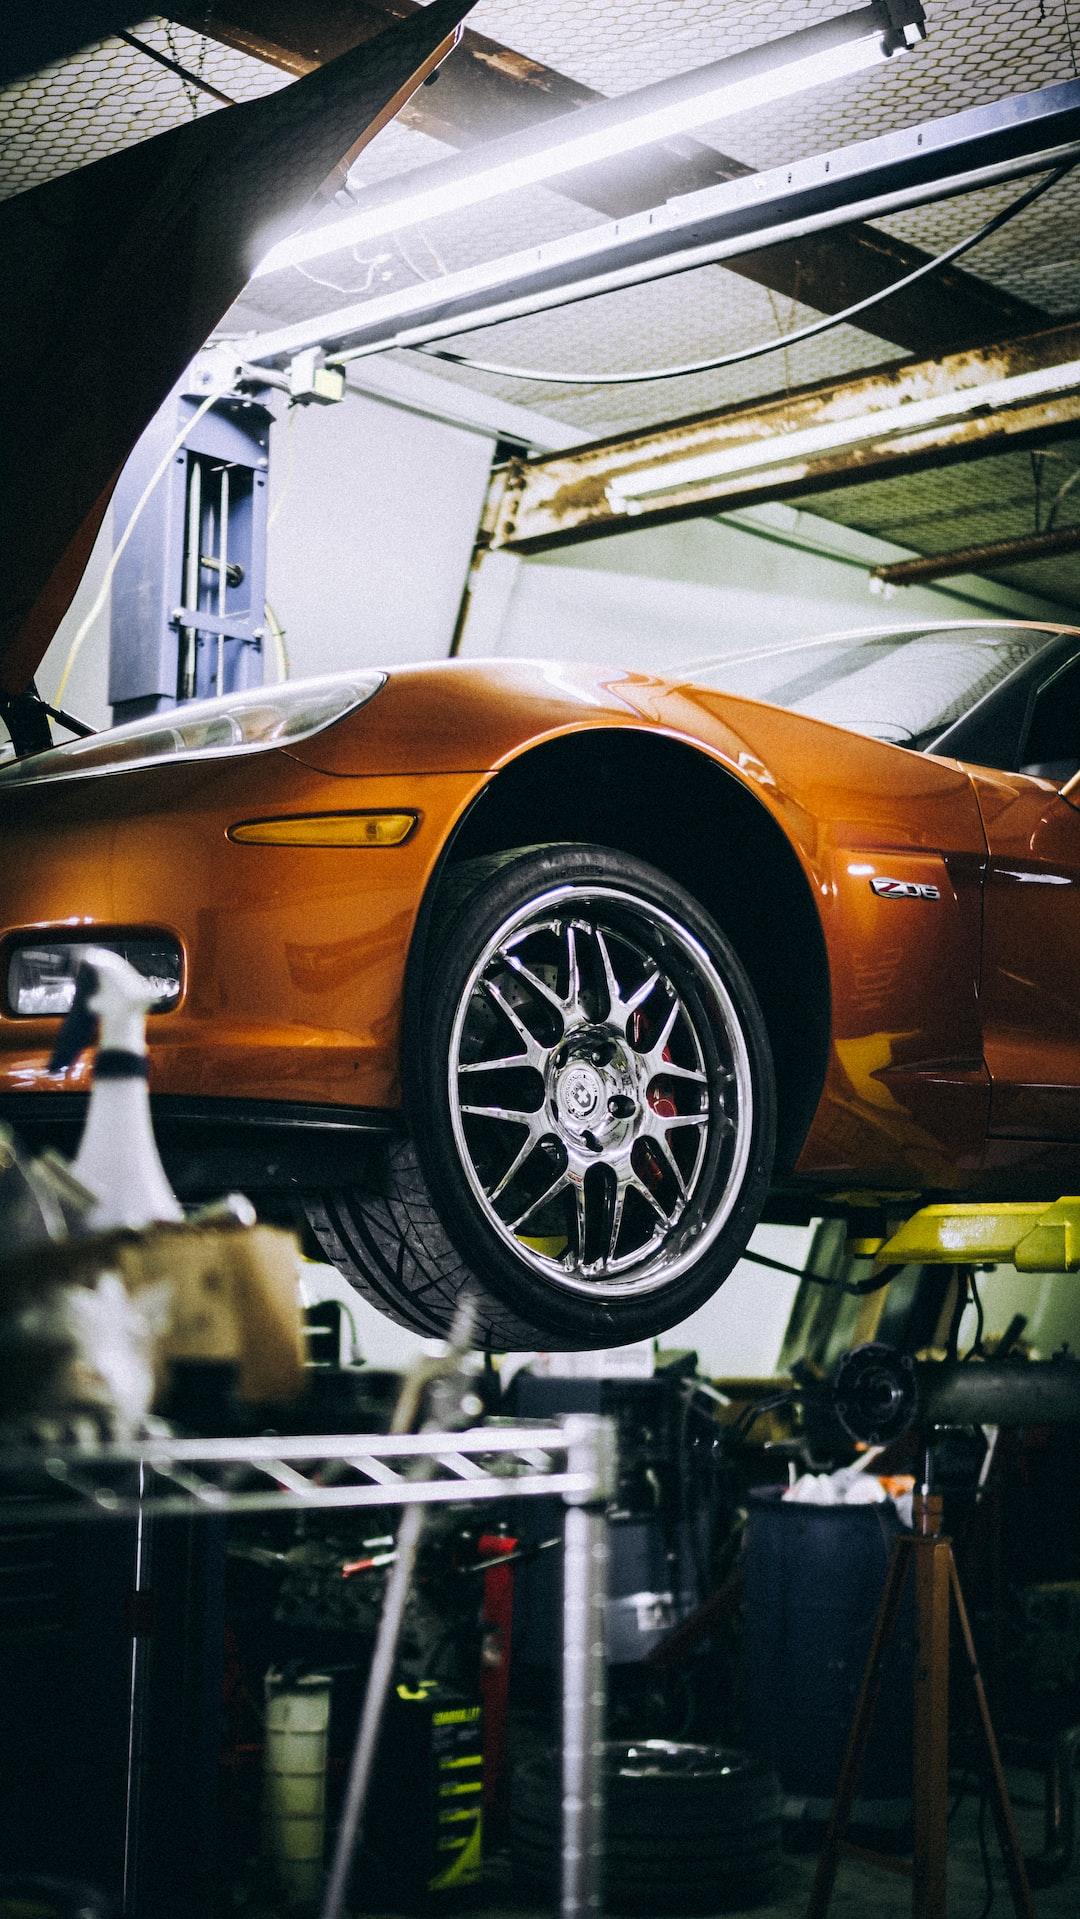 5 Steps to Help You Find a Trustworthy Garage in York 2021